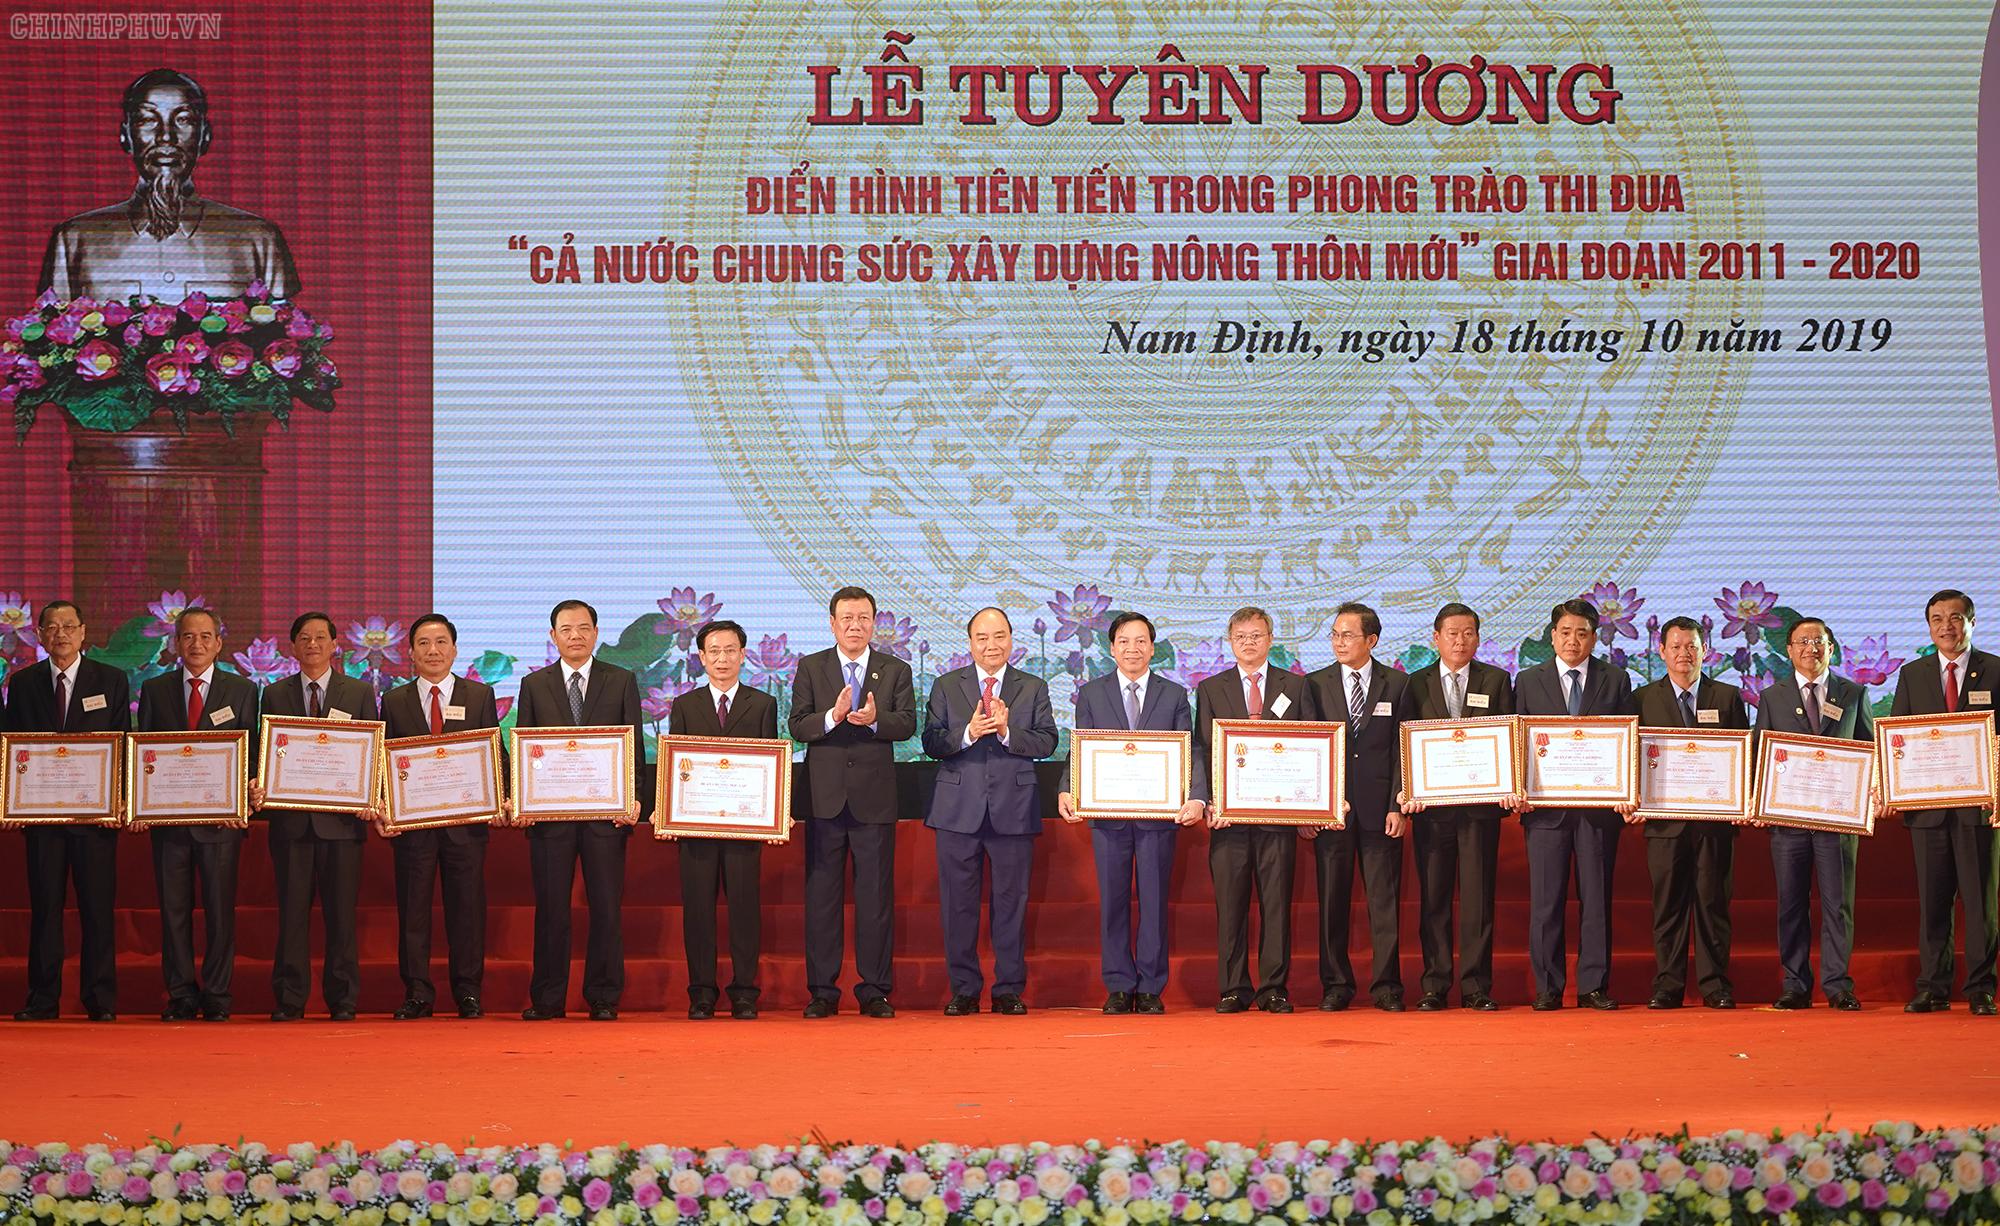 Thu-tuong-trao-HC-Doc-Lap-va-HC-lao-dong-cho-cac-tinh-thanh-pho-truc-thuoc-TW-ban-bo-nganh-doan-the-TW-.jpg